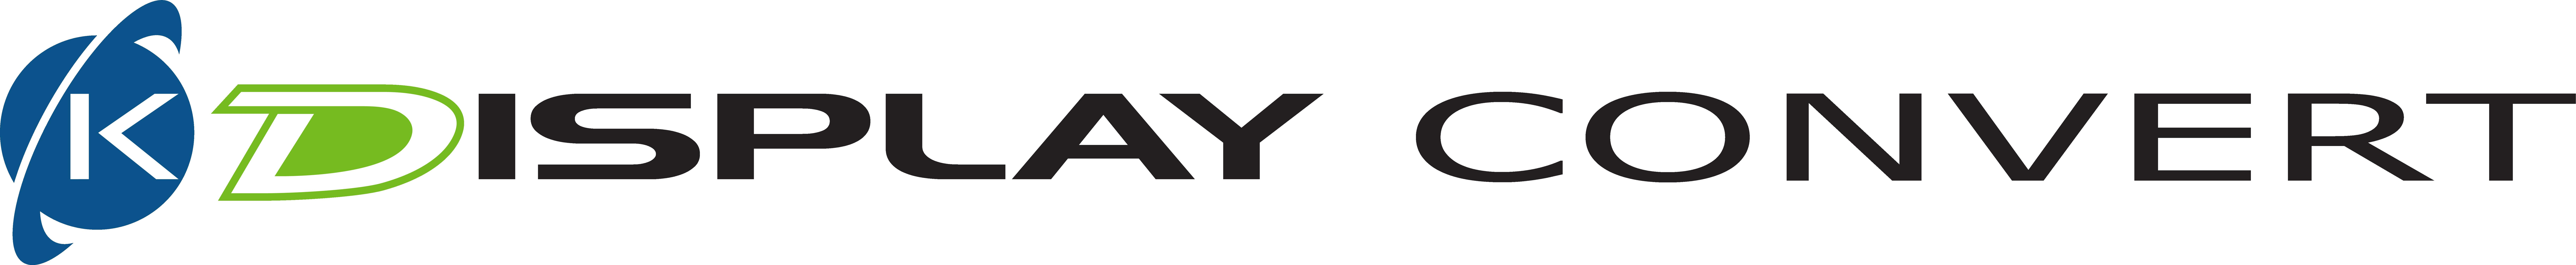 K-Display-Convert-logo-final-color